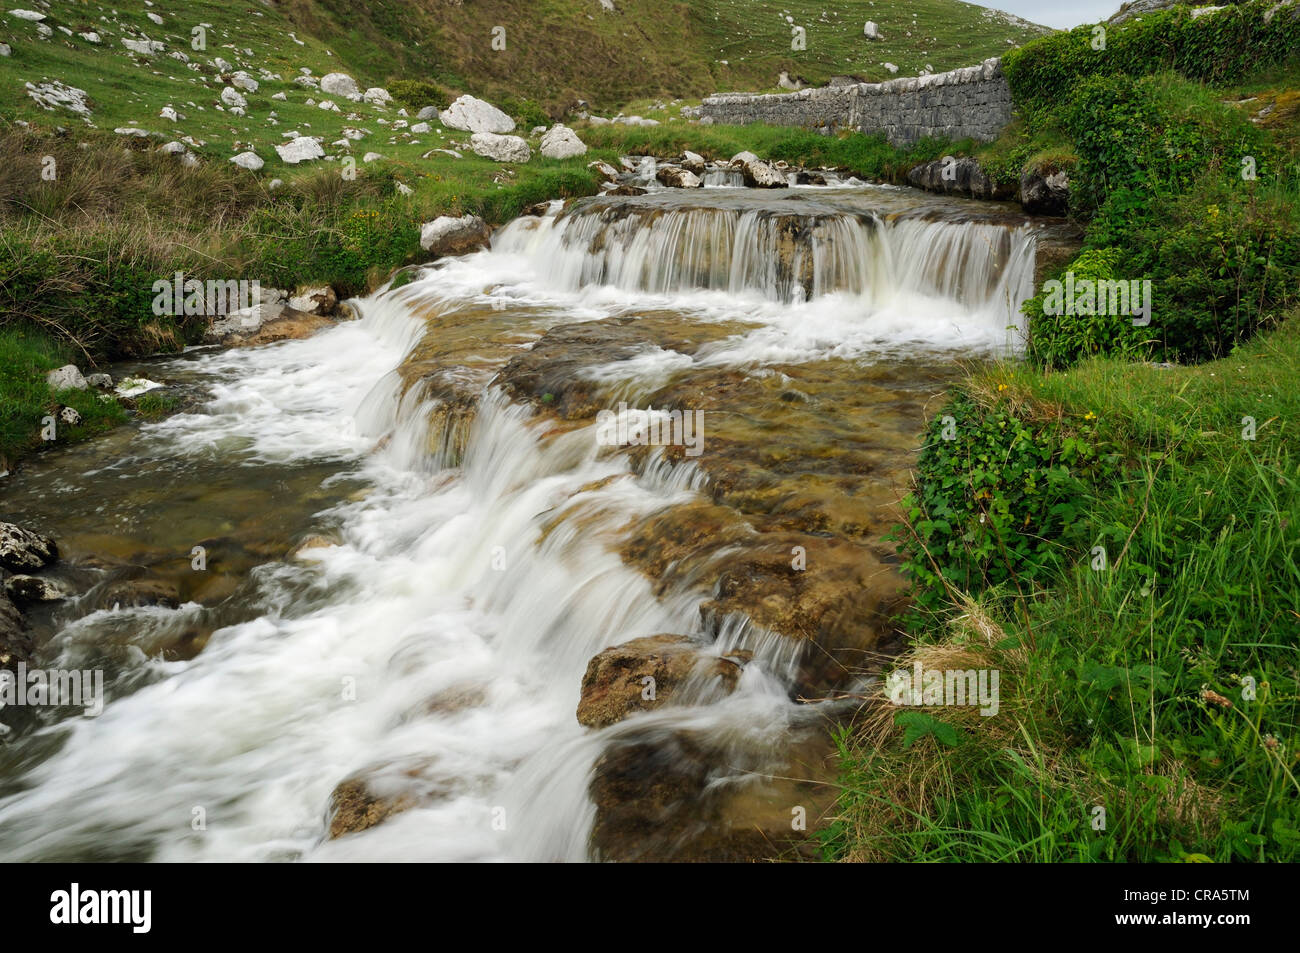 La Catarata del Río cerca de Fanor Caher, el Burren Imagen De Stock